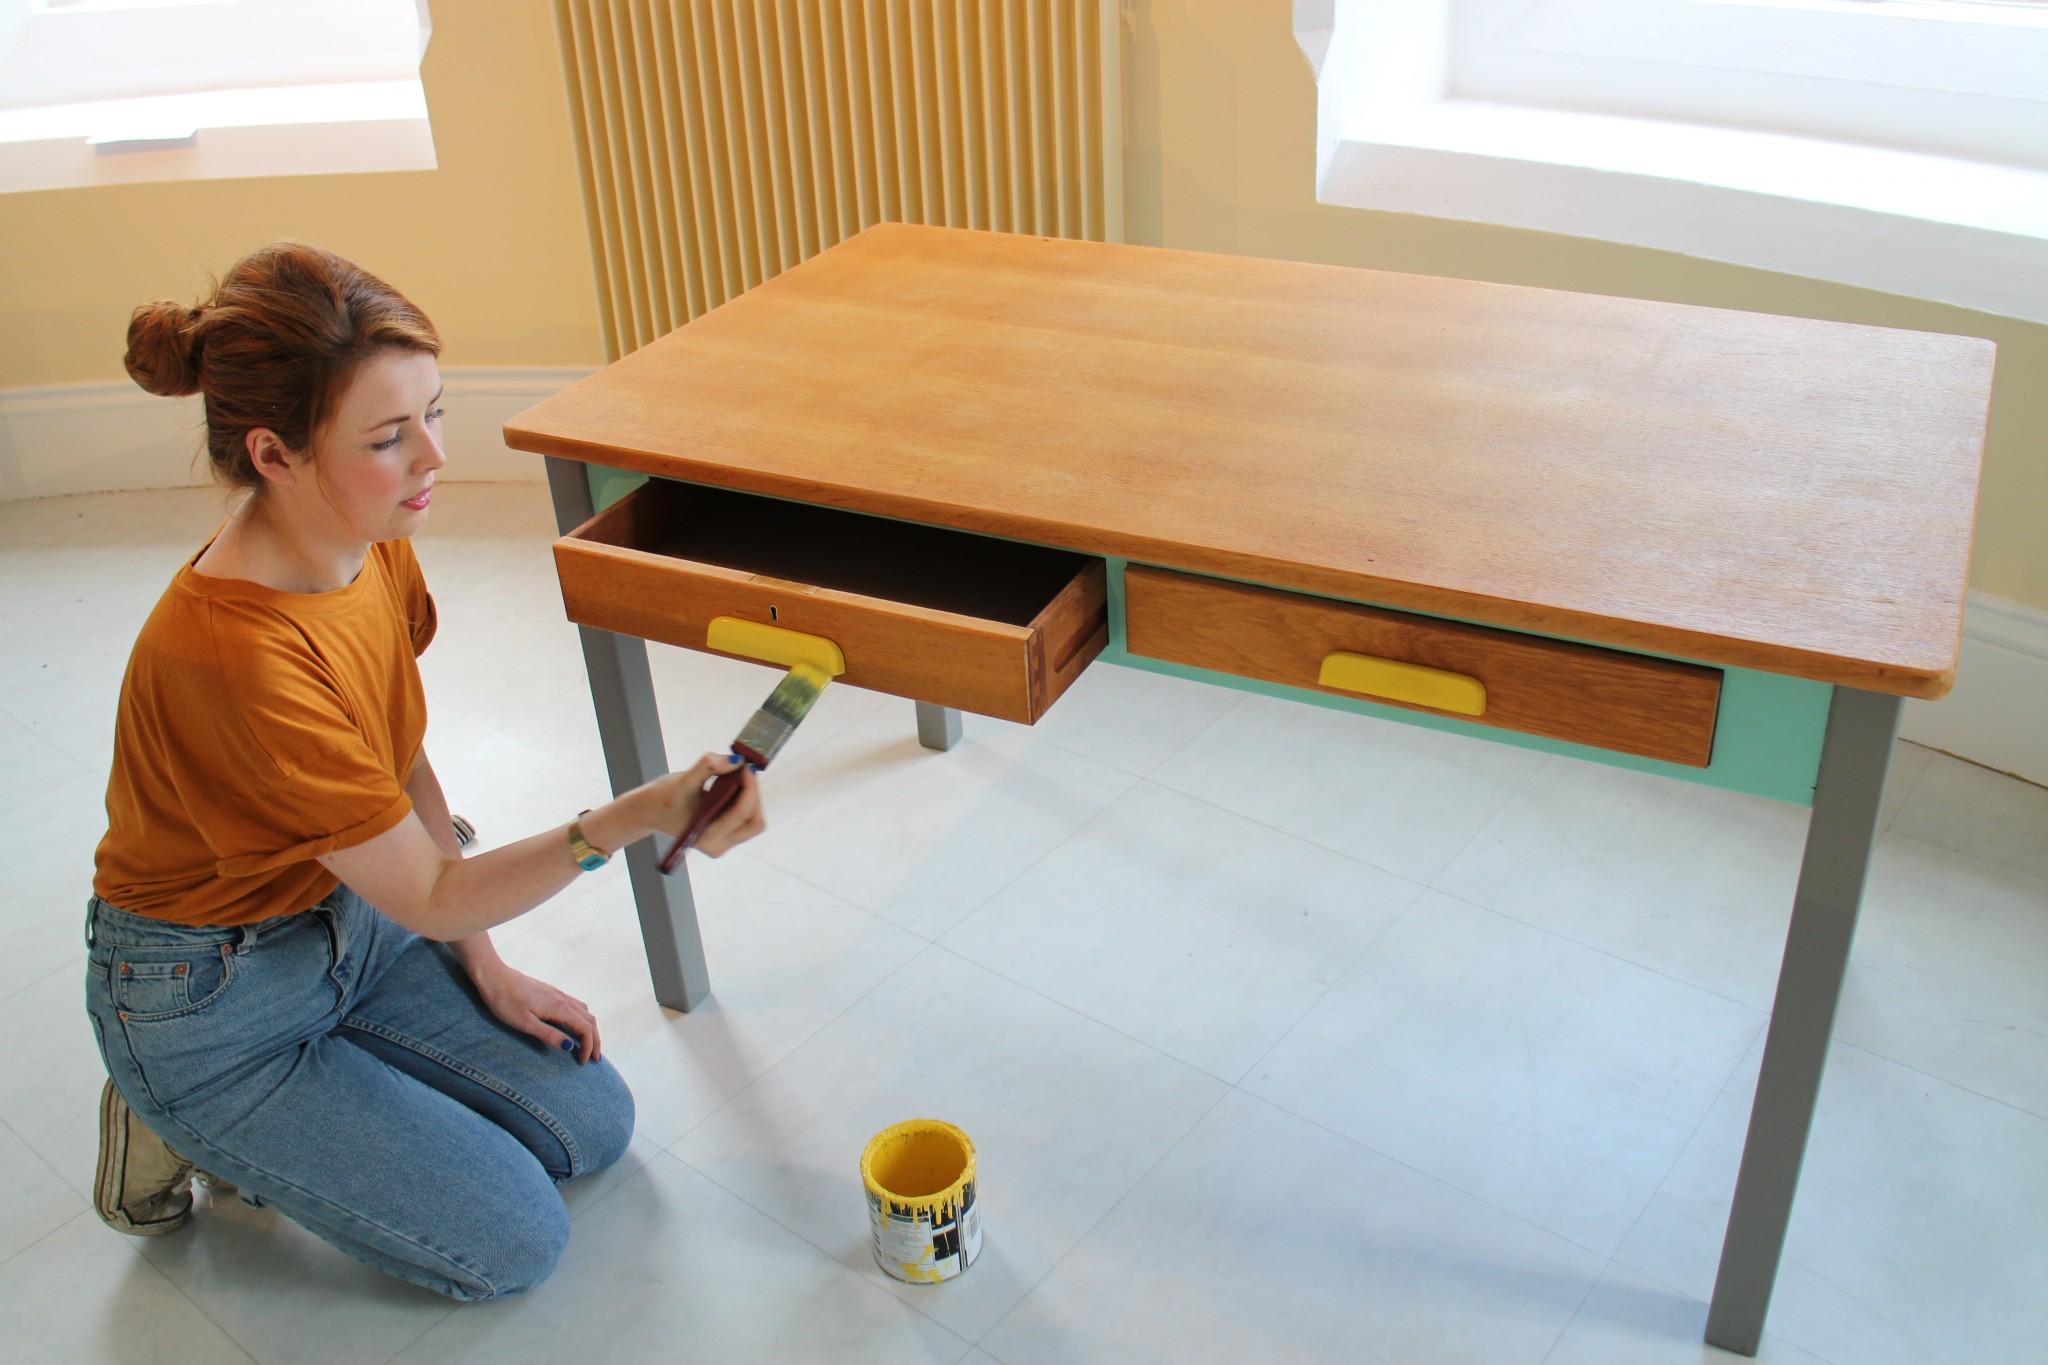 sawdust furniture. Interview With Amy Dolan, Founder Ziggy Sawdust, An Award-winning Furniture Redesign Business Sawdust